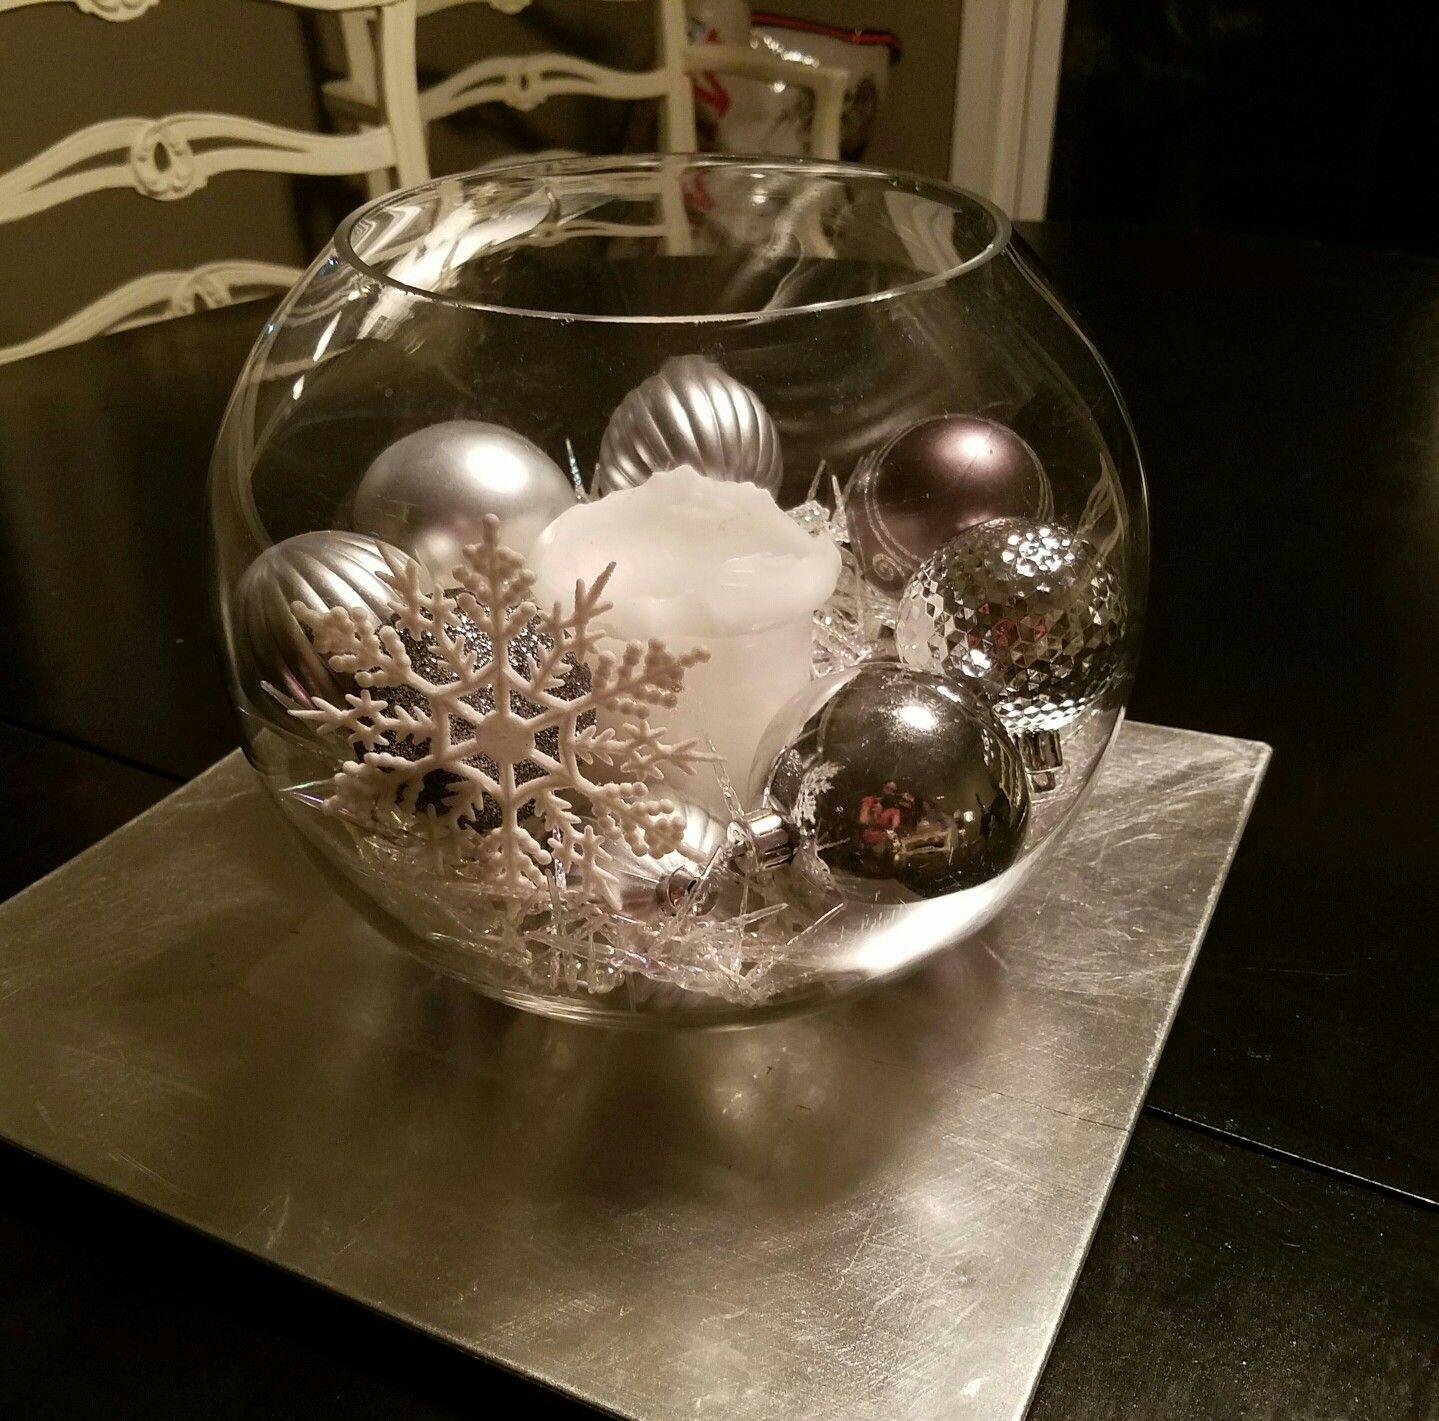 Fish Bowl Wedding Centrepiece Ideas: Christmas Fish Bowl Centerpiece